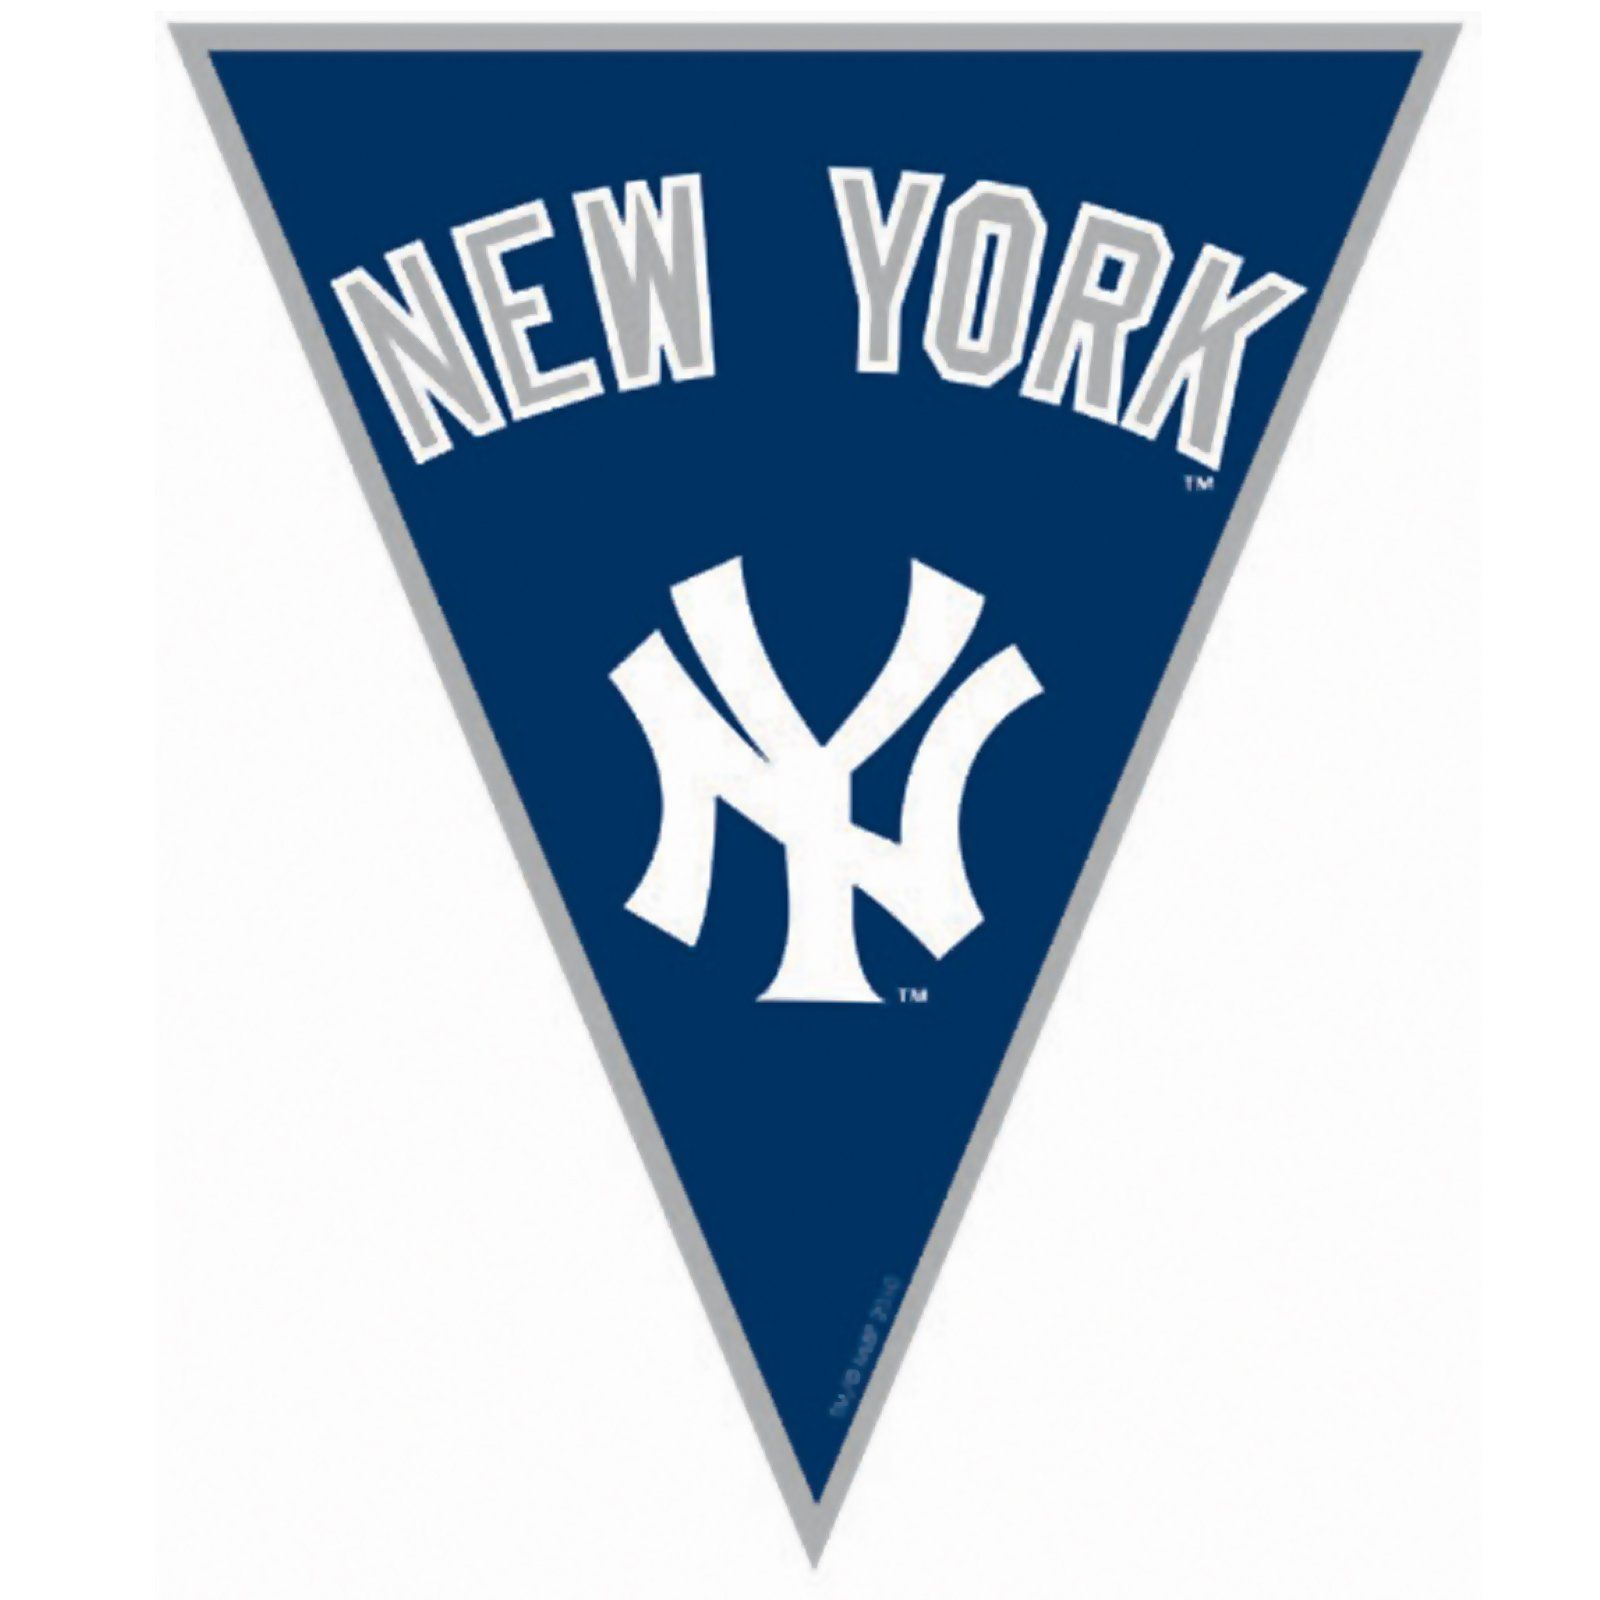 New York Yankees Baseball Pennant Banner Baseball Pennants New York Yankees Baseball Yankees Baseball